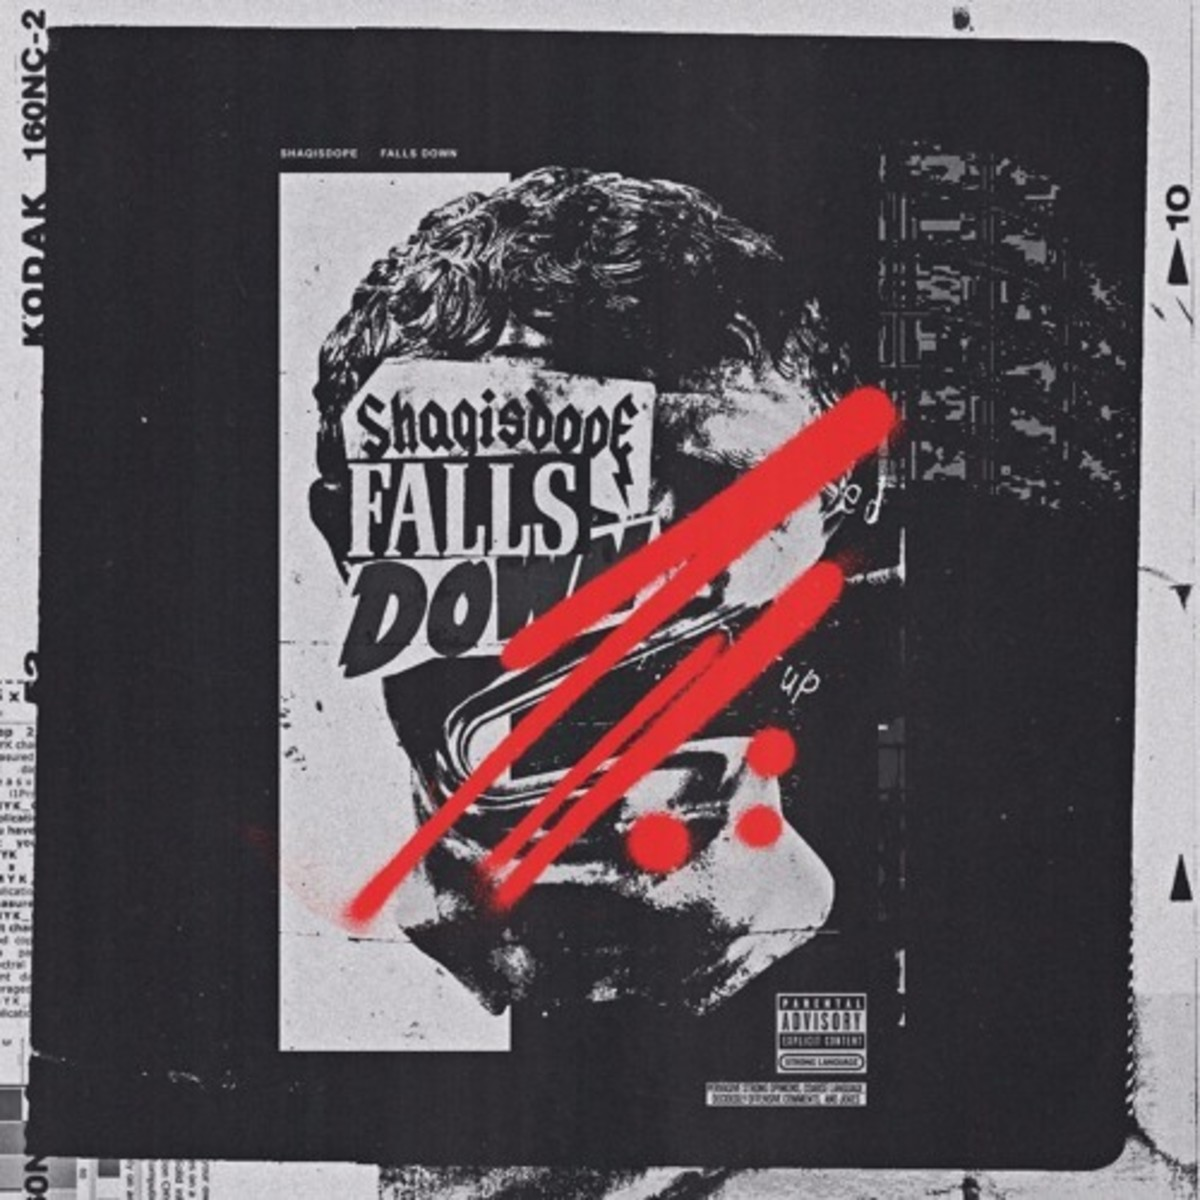 shaqisdope-falls-down.jpg